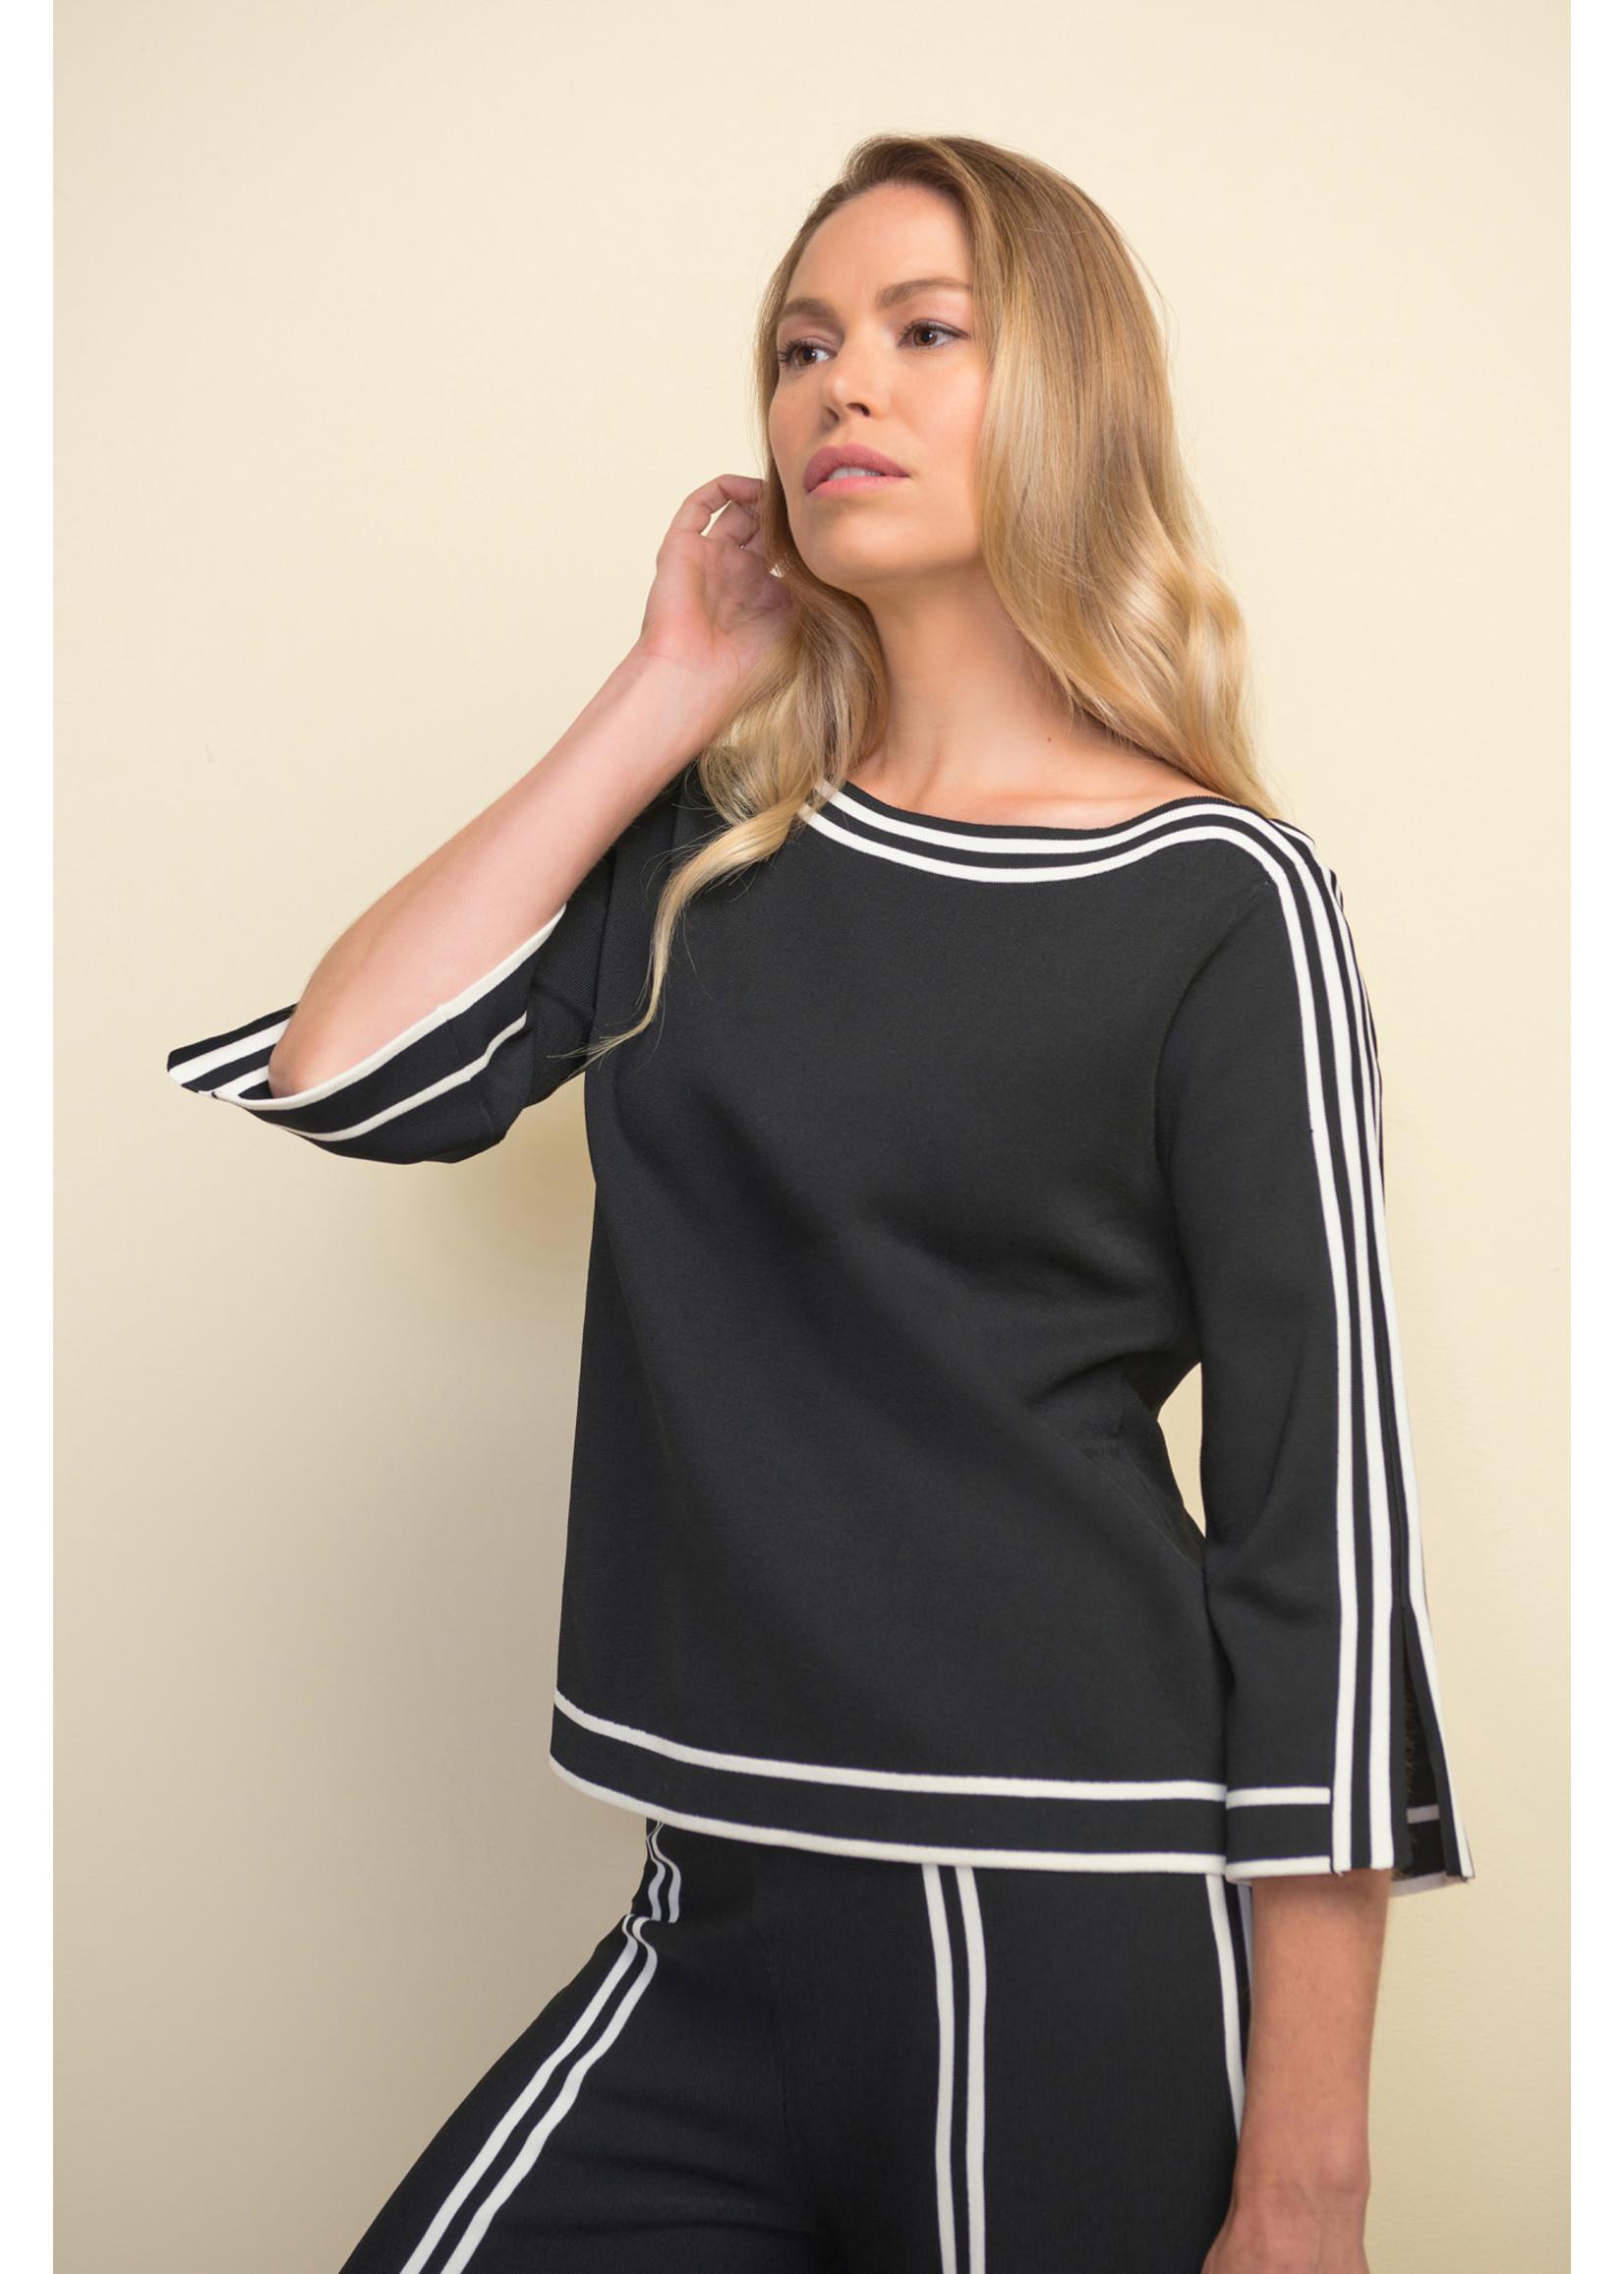 Joseph Ribkoff Black & Vanilla Sweater